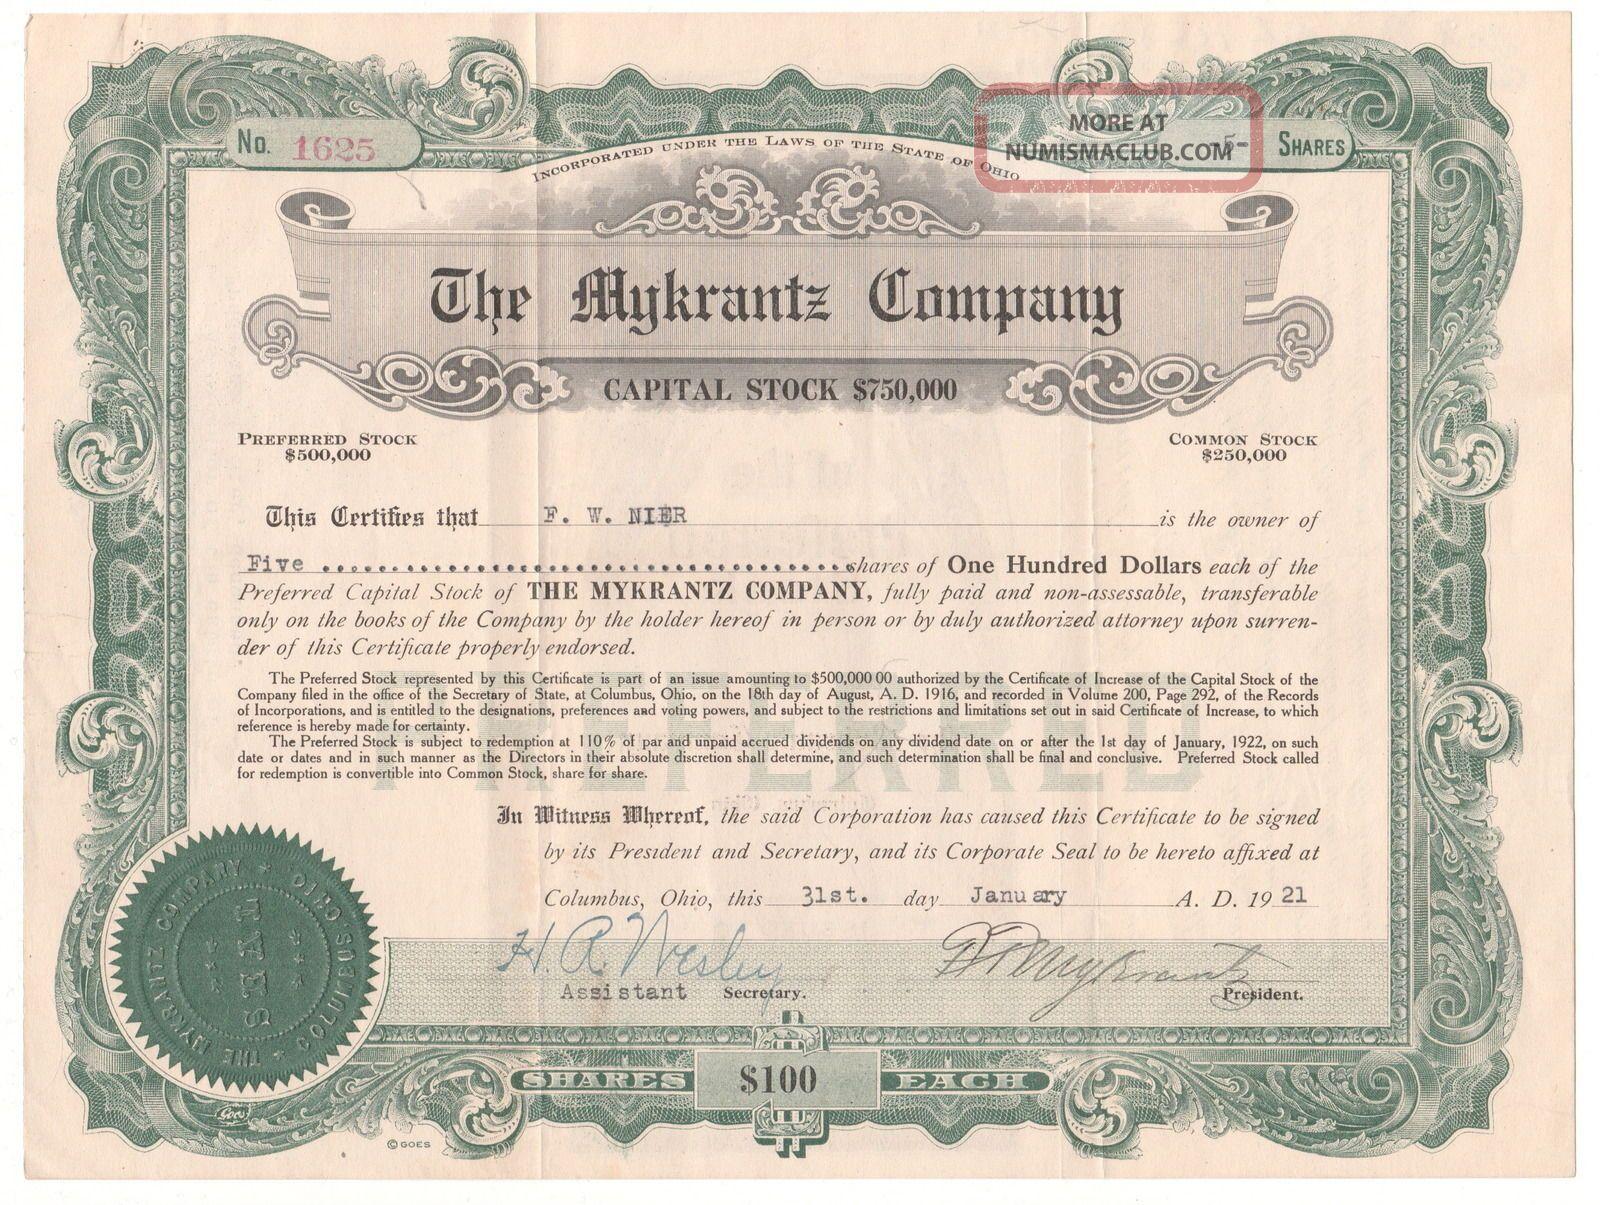 Vintage Mykrantz Company Stock Certificate 5 Shares 1921 Ohio ? Drug Store ? Stocks & Bonds, Scripophily photo